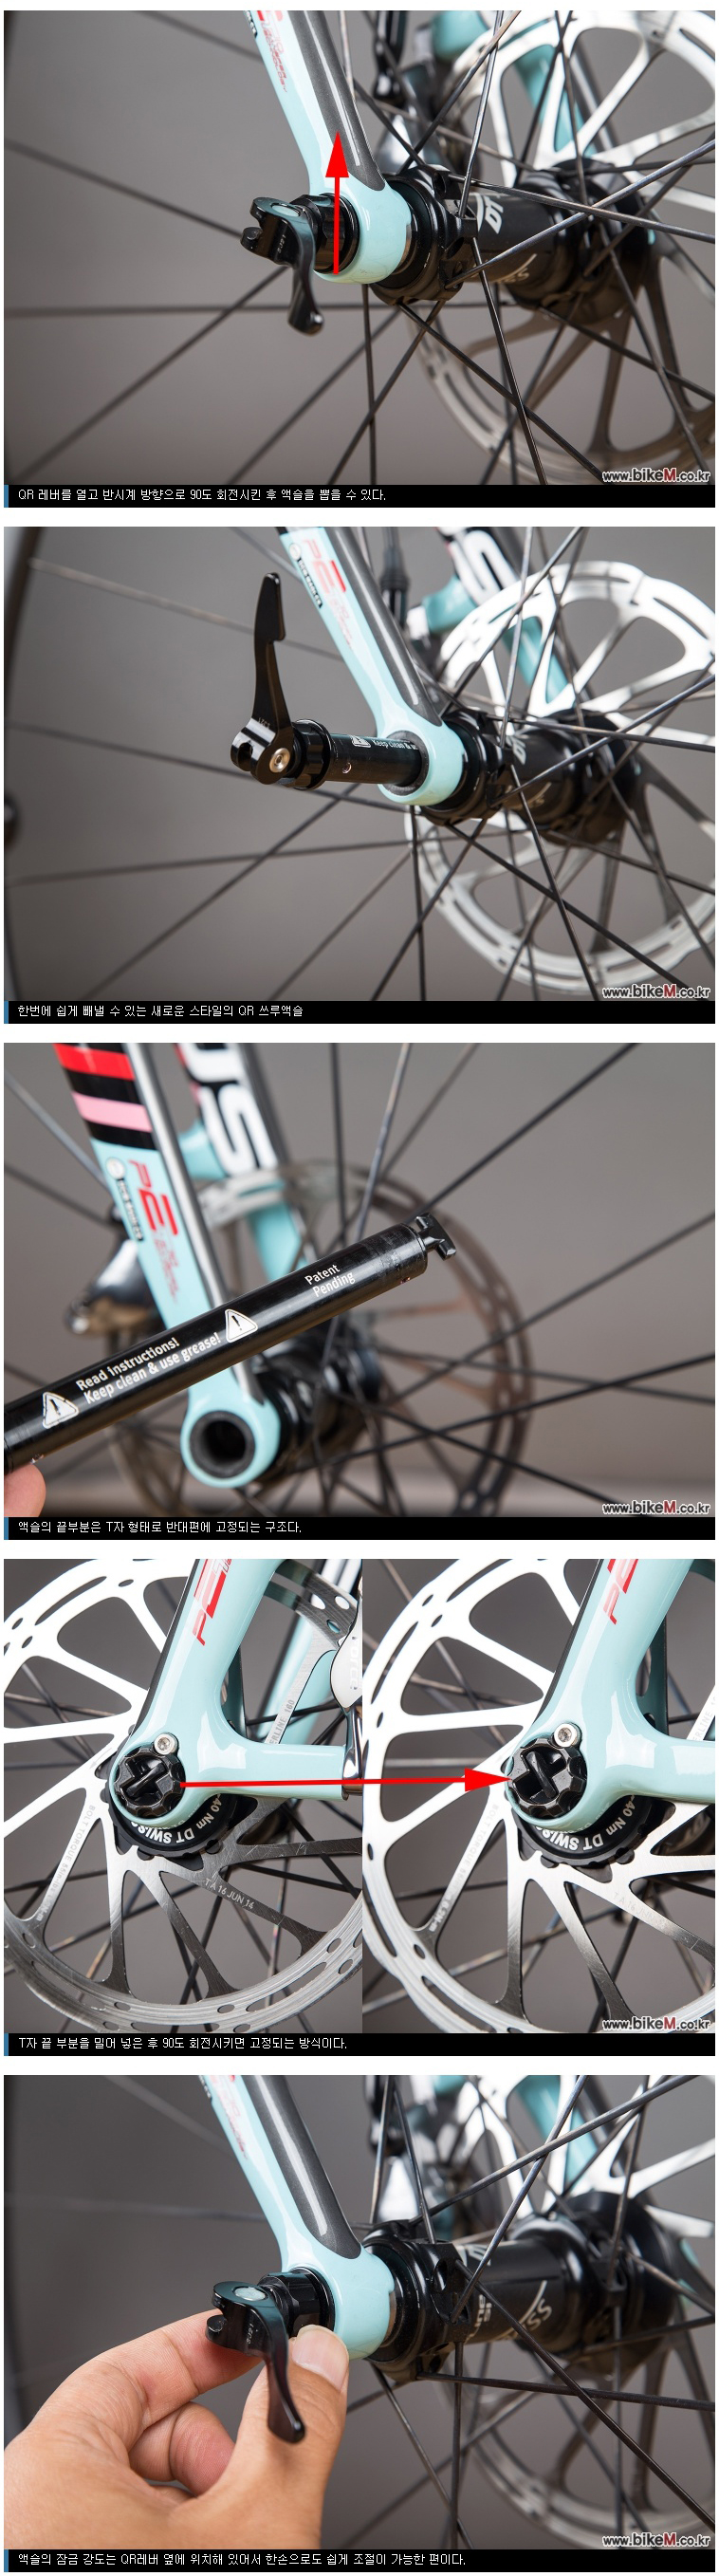 bikem_co_kr_20150709_101702.jpg